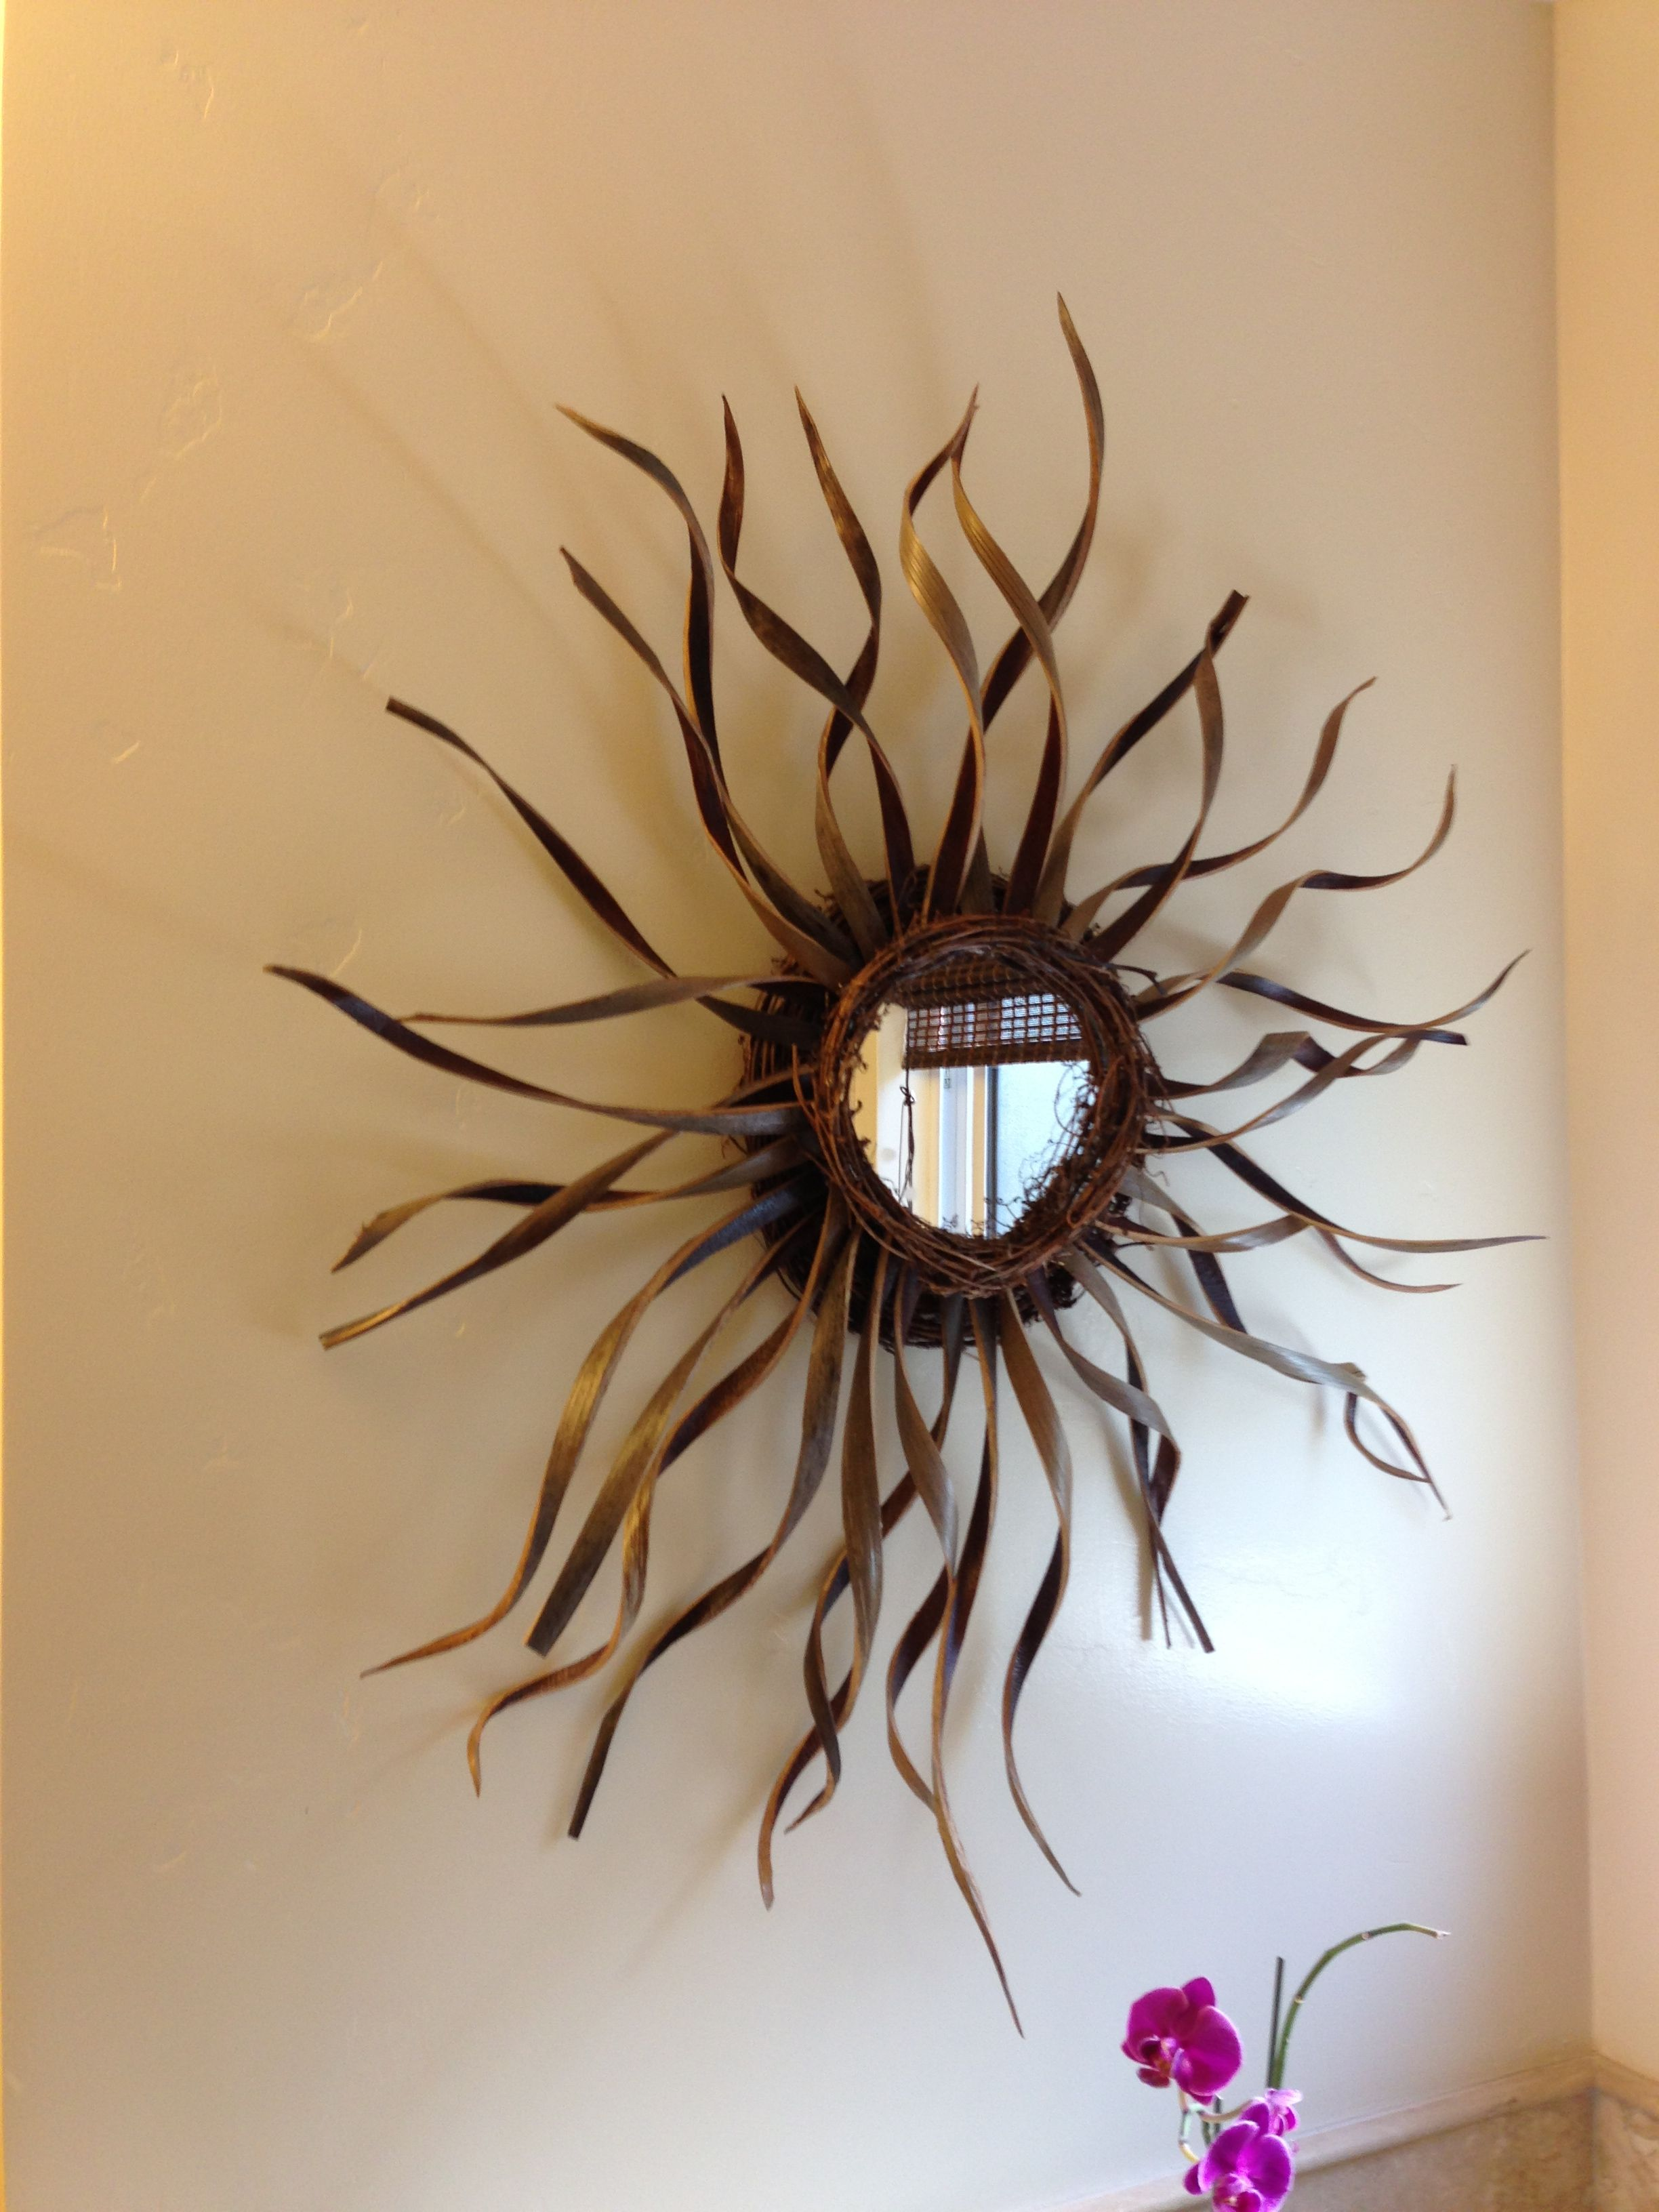 Sunburst Mirror Wall Decor Sunburst Wall Decor Mirror Wall Decor Outdoor Wall Decor